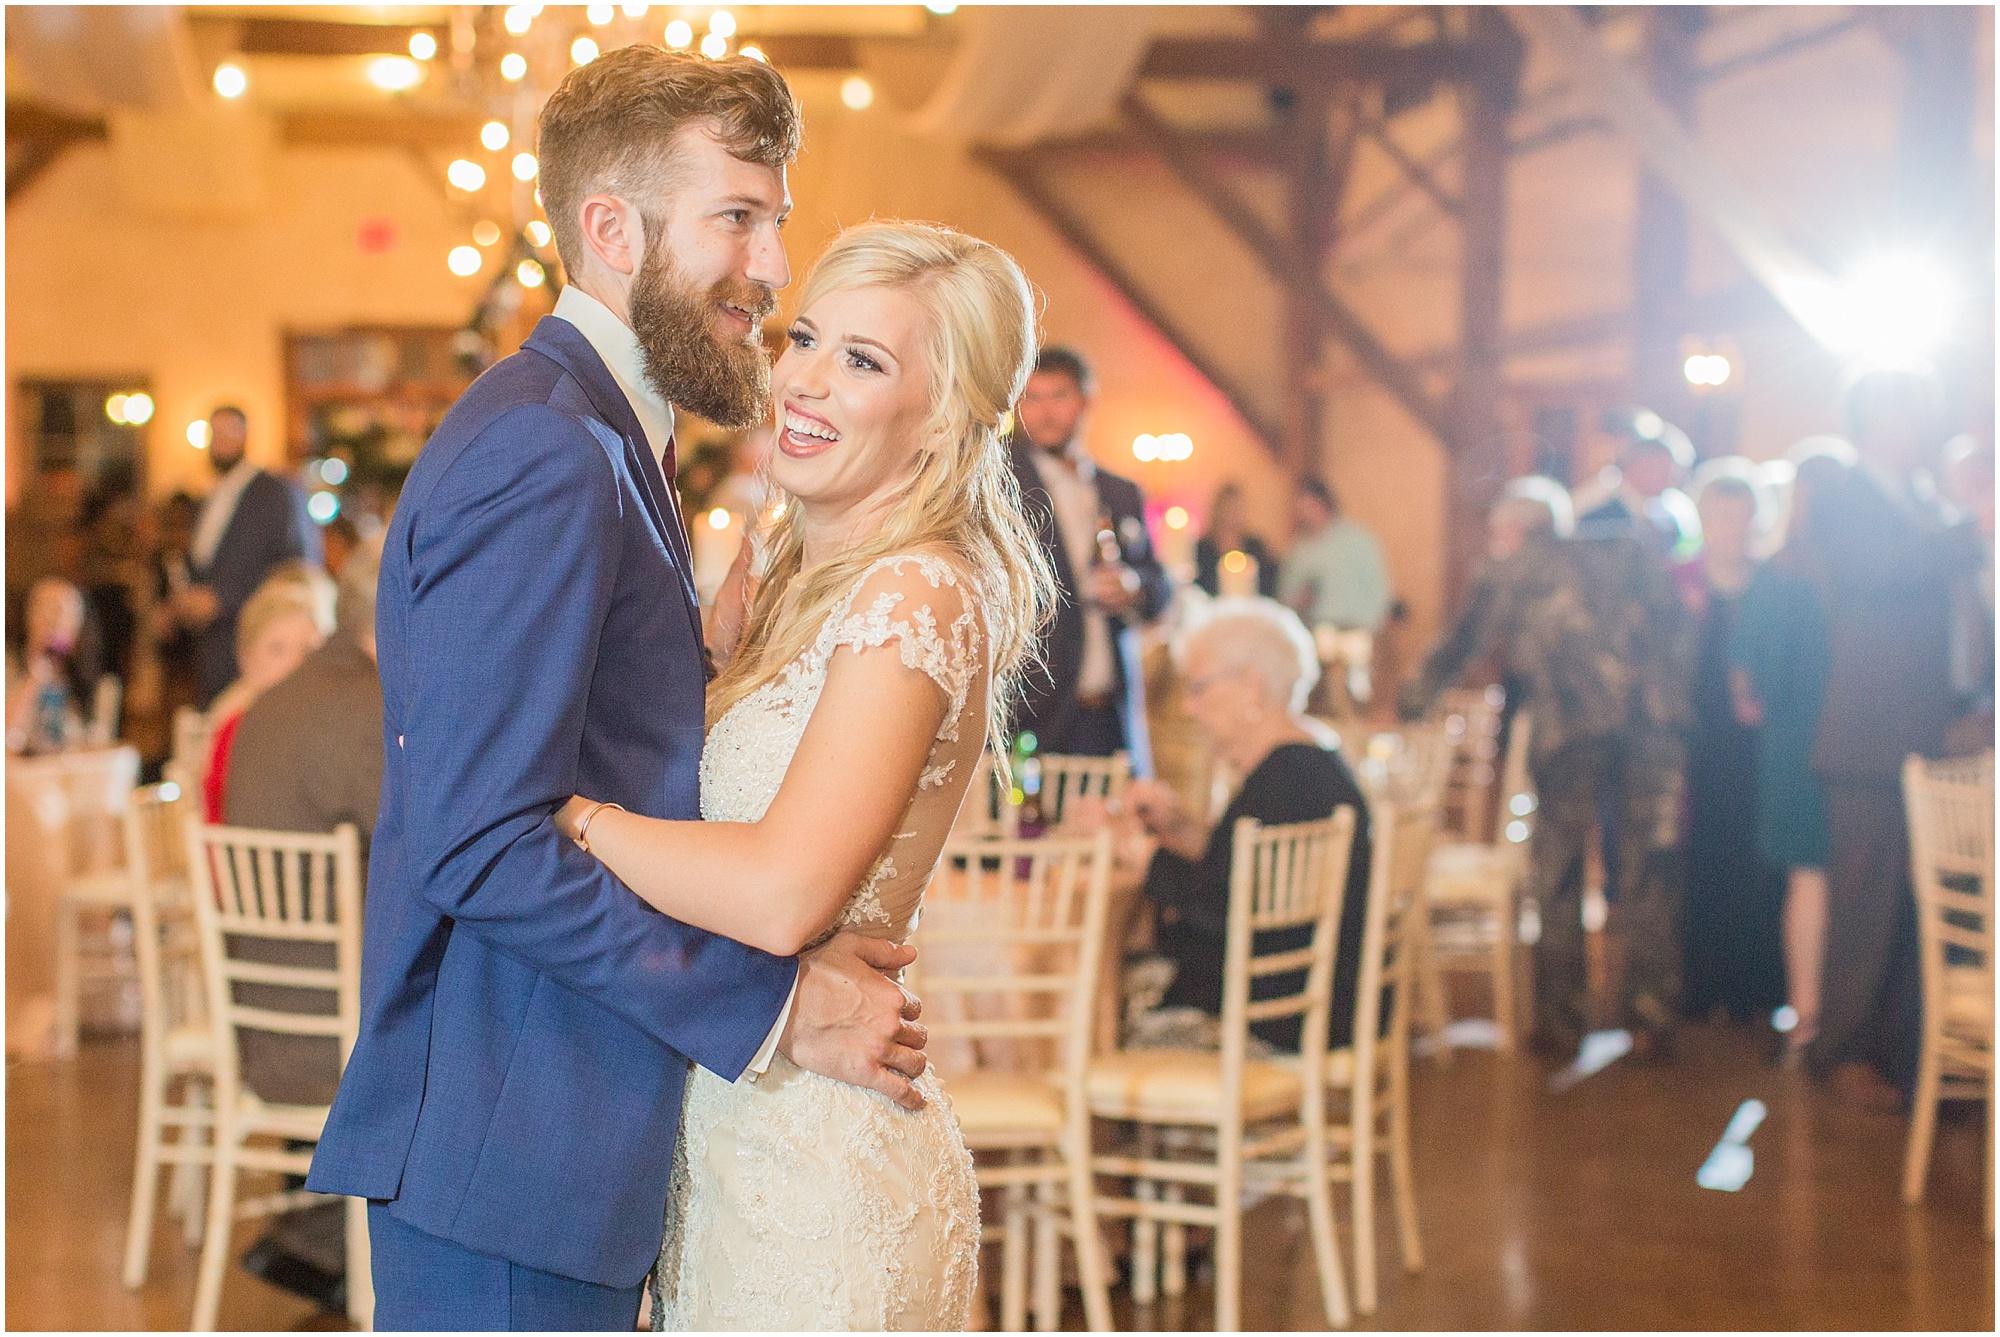 fall-wedding-bridlewood-of-madison-mississippi_0067.jpg